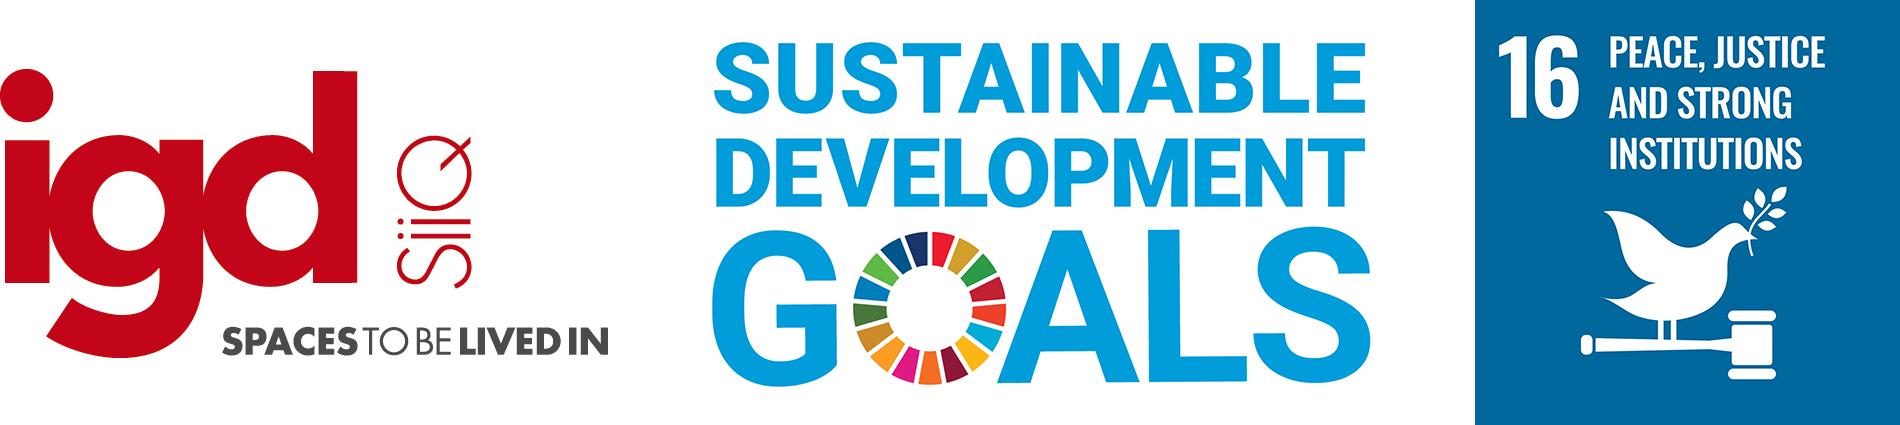 SDG_IGD_eng_16